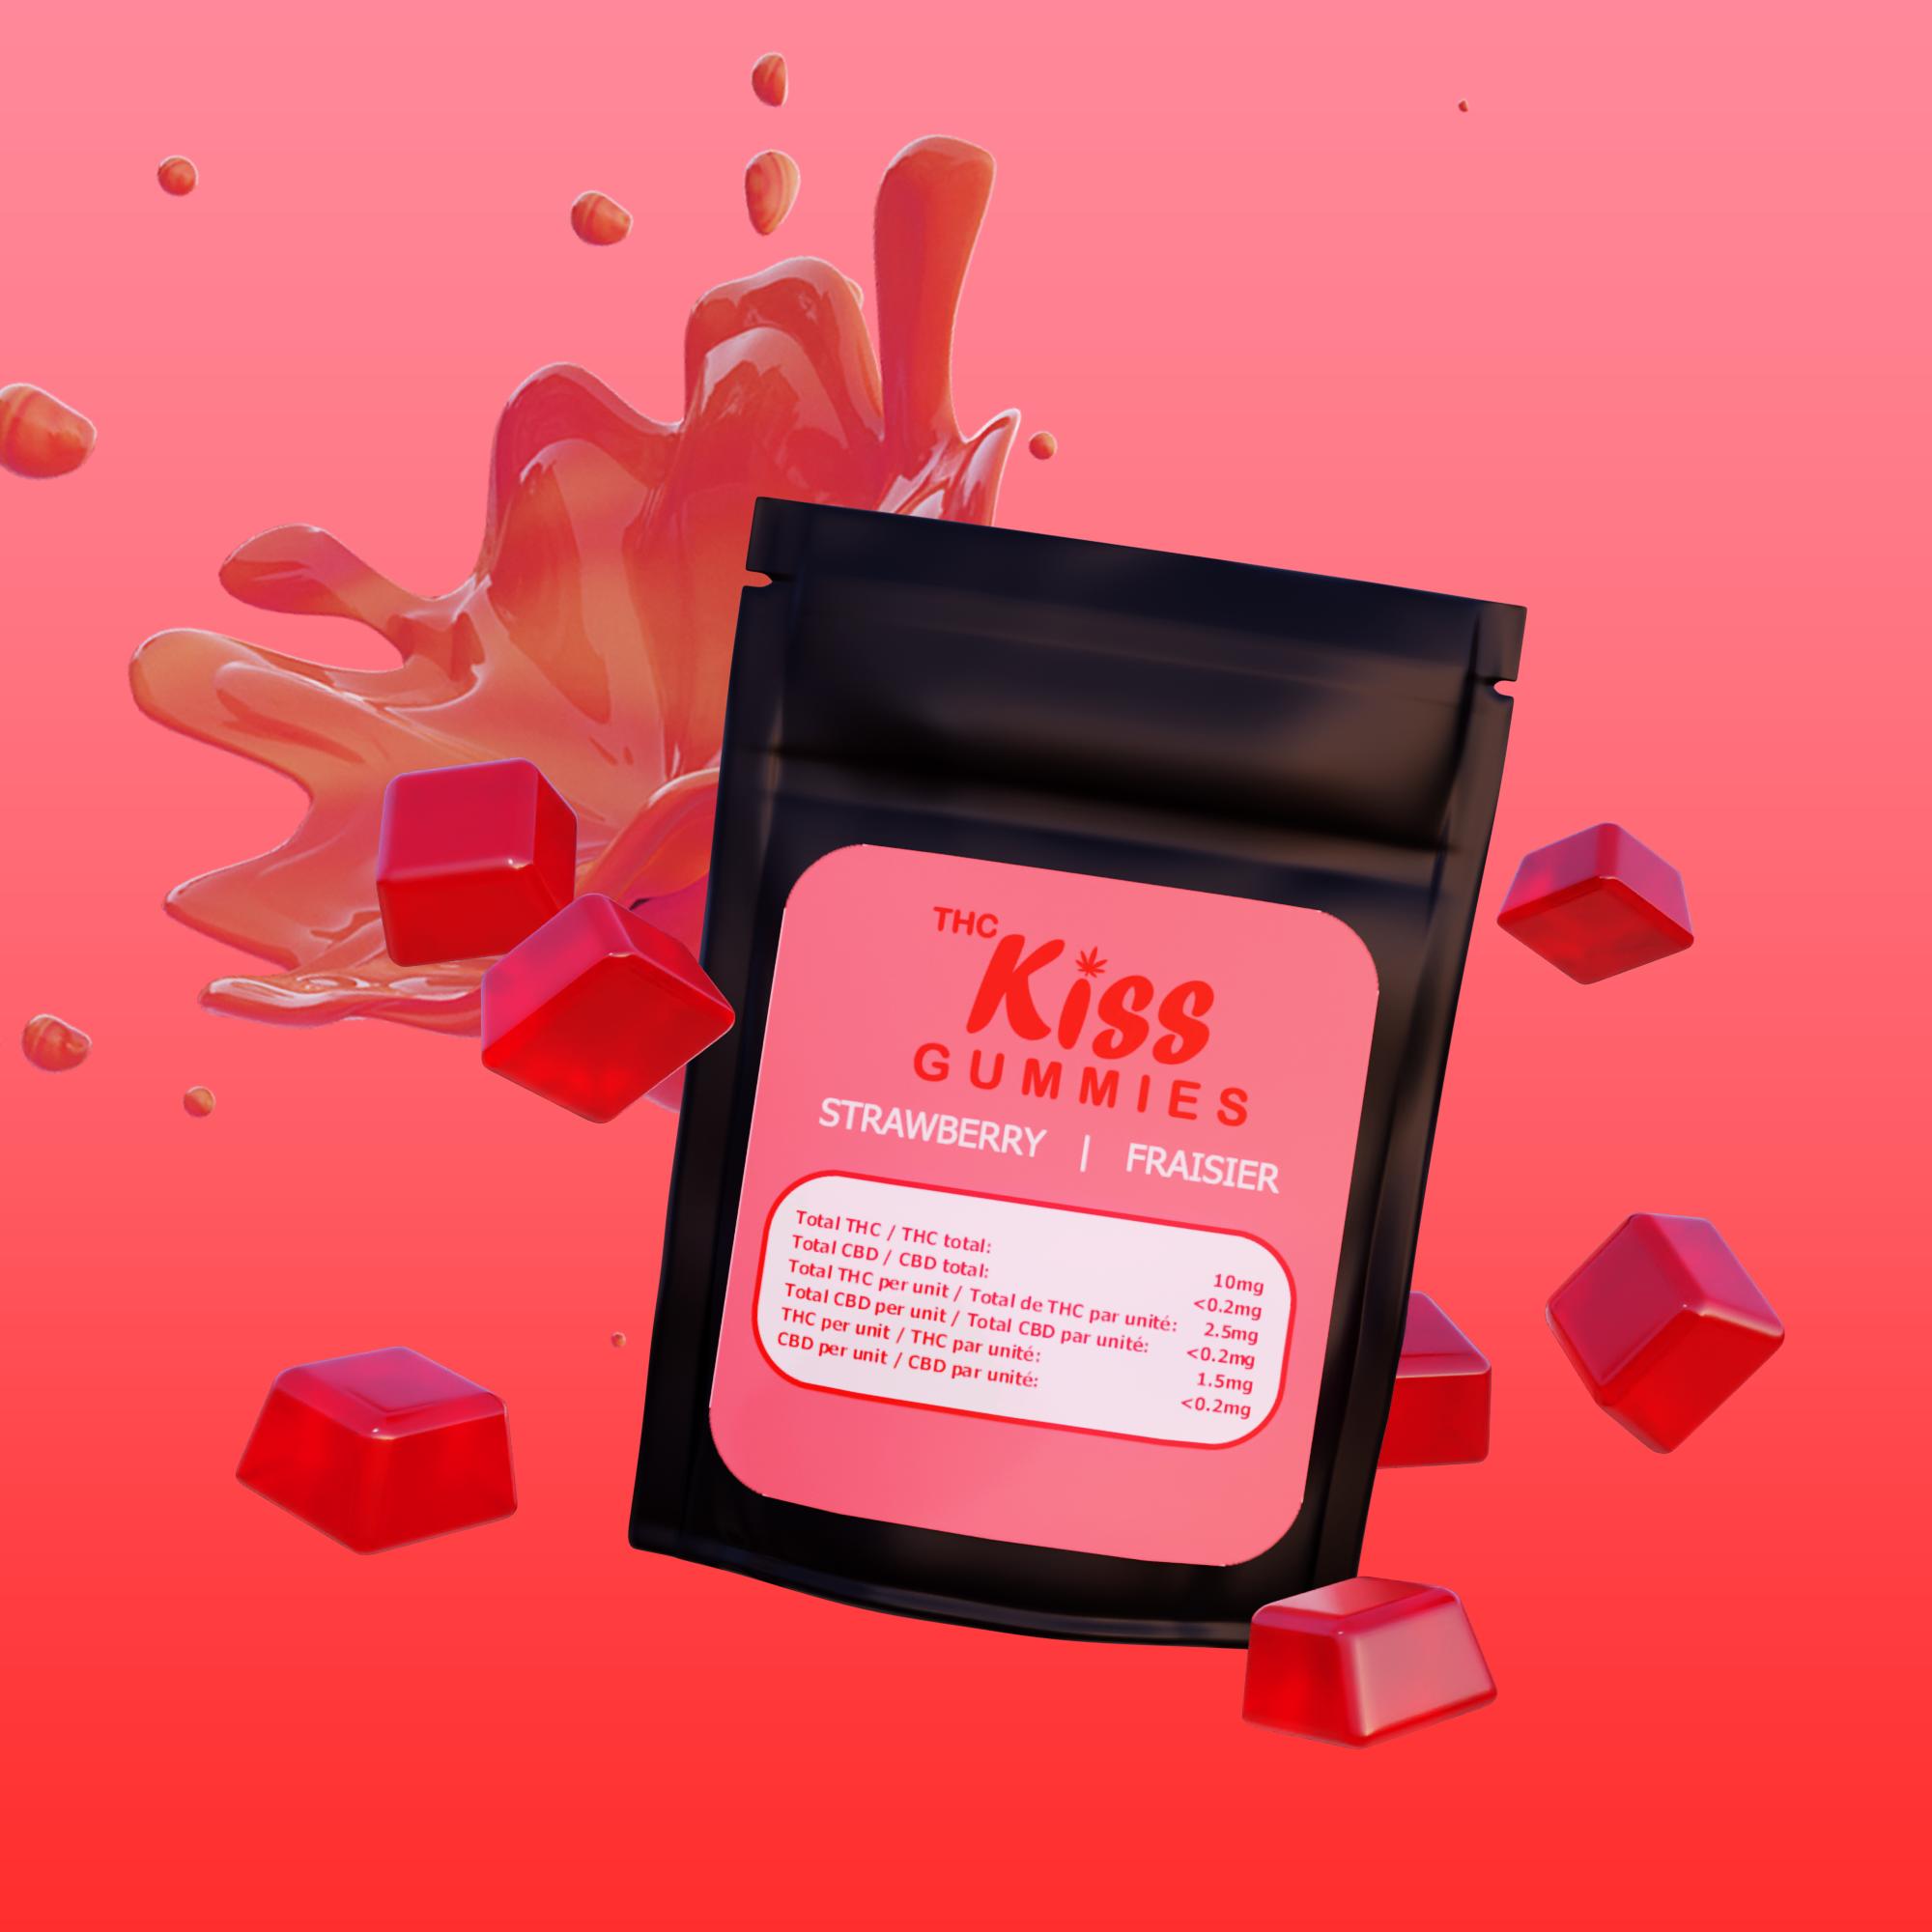 strawberry gummy imagery